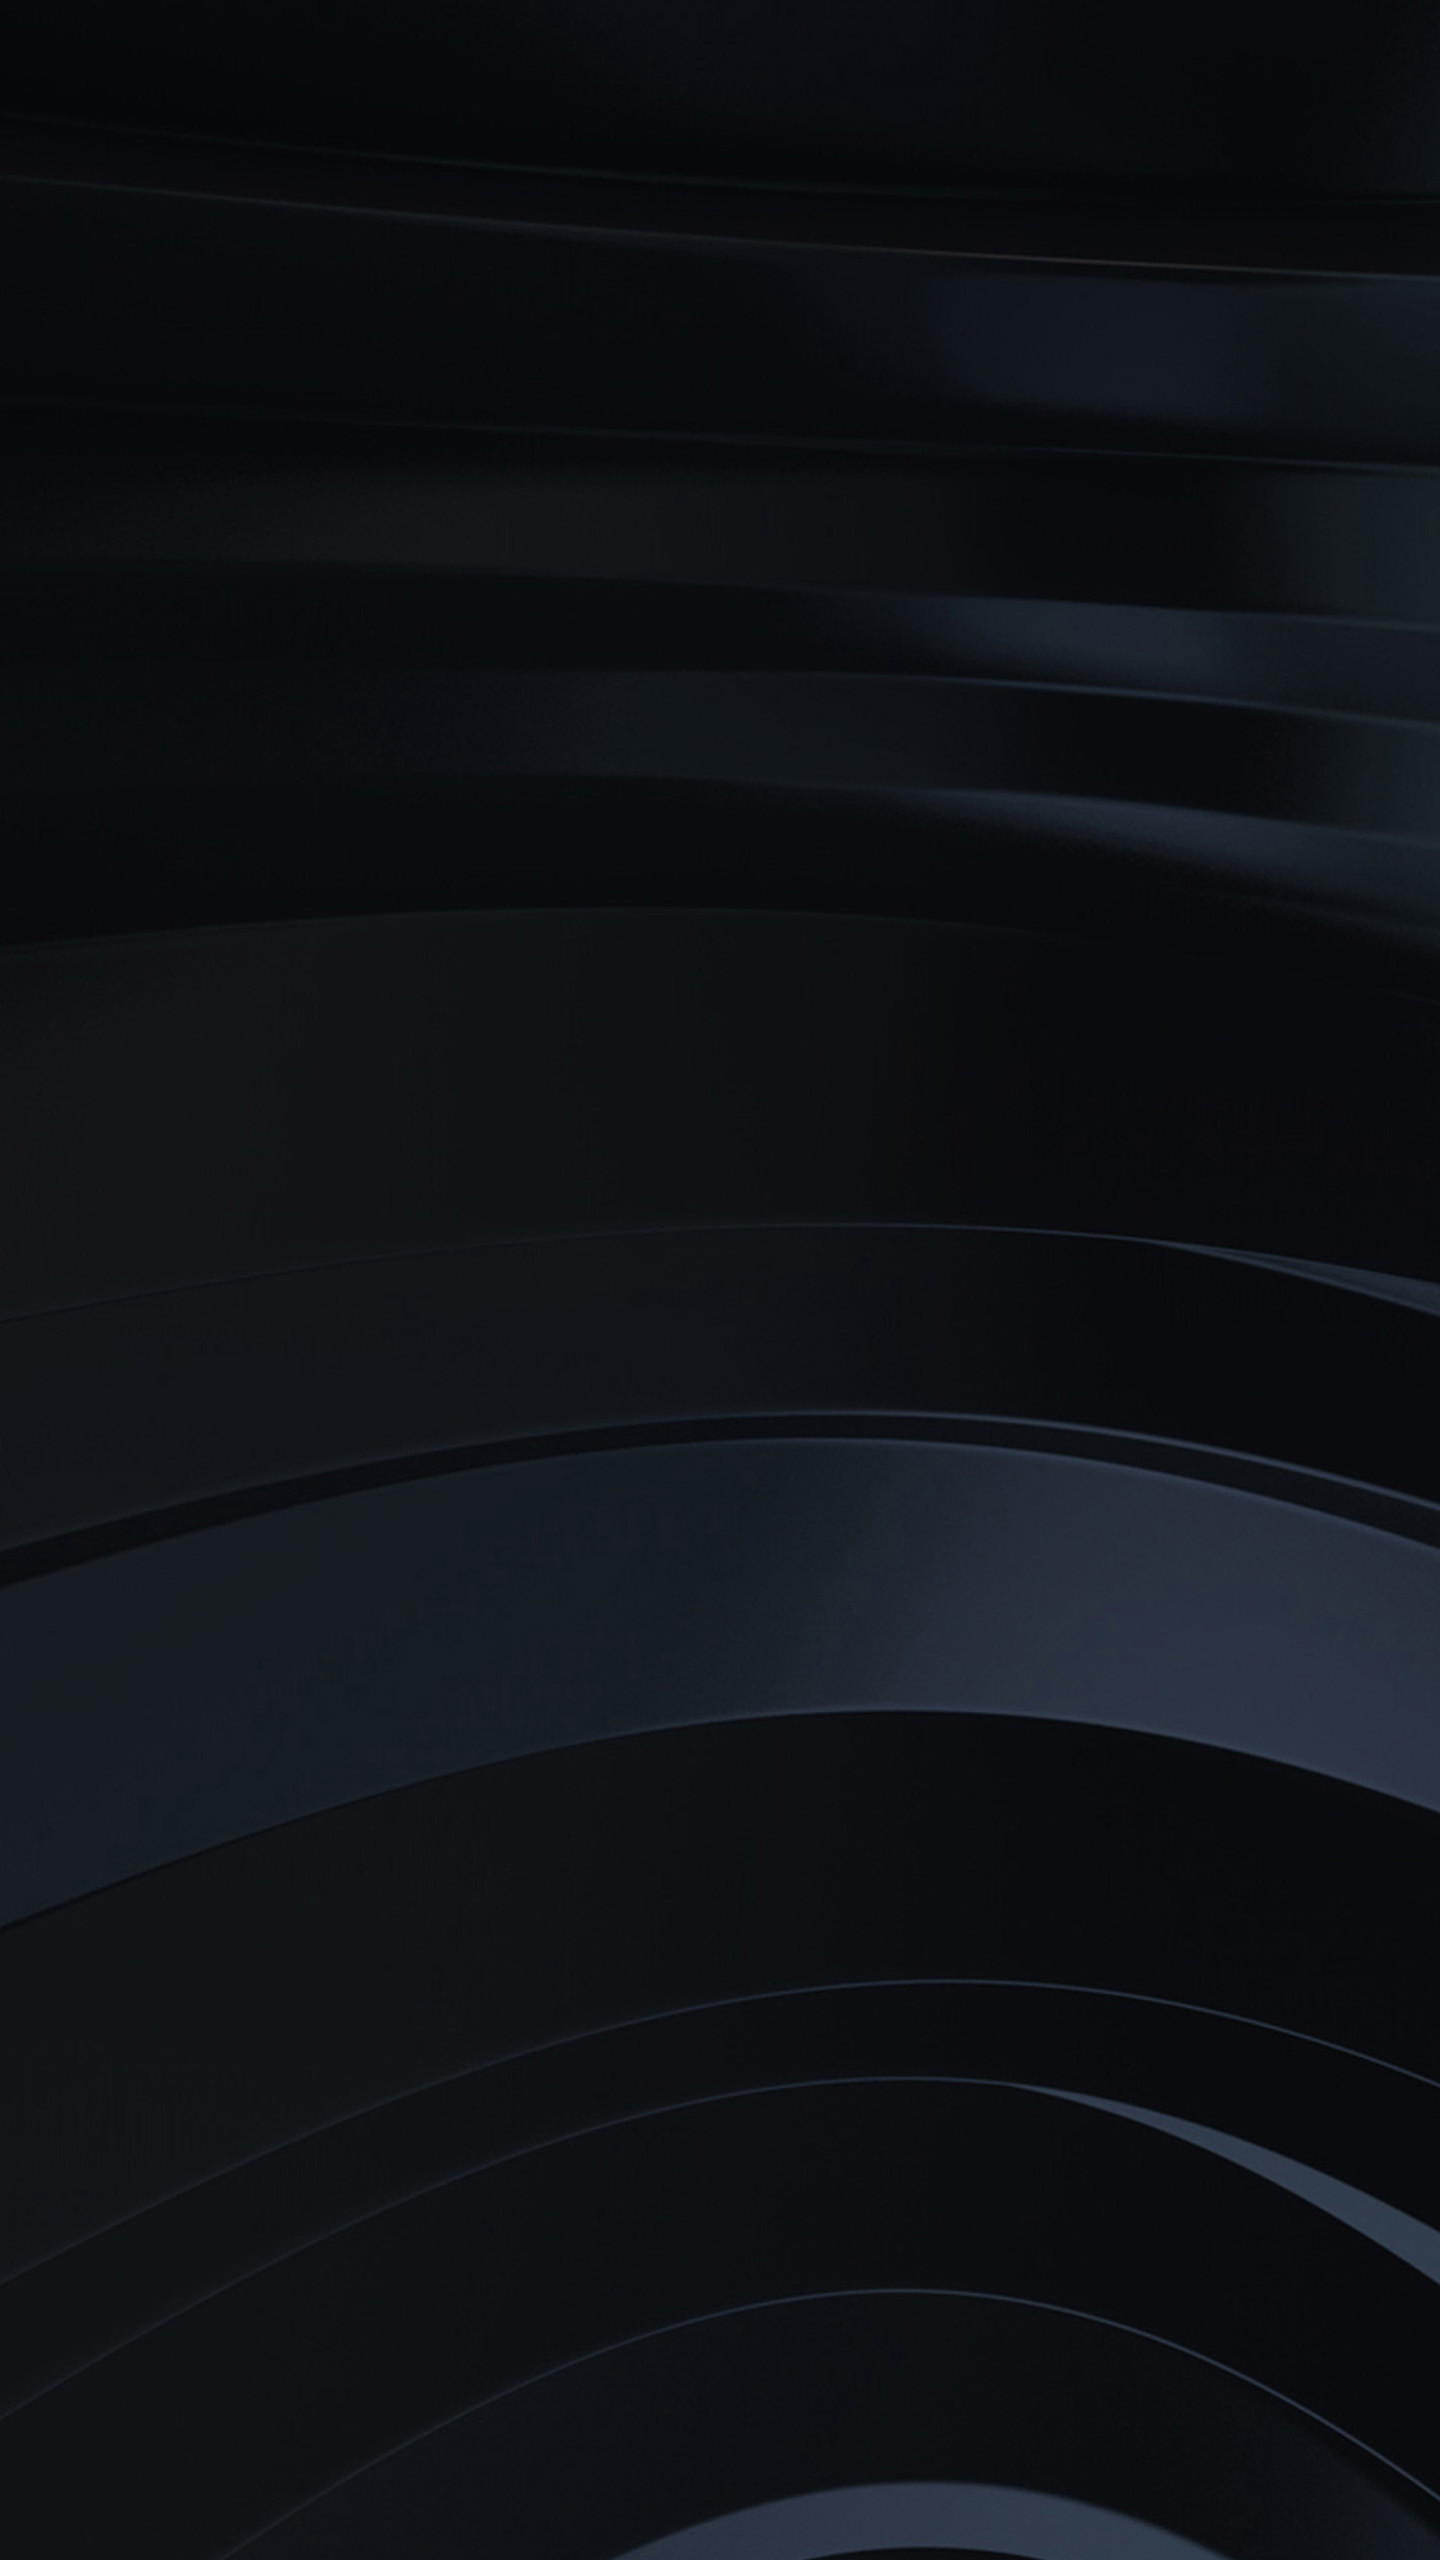 Black color 01 Galaxy Note 4 Wallpapers